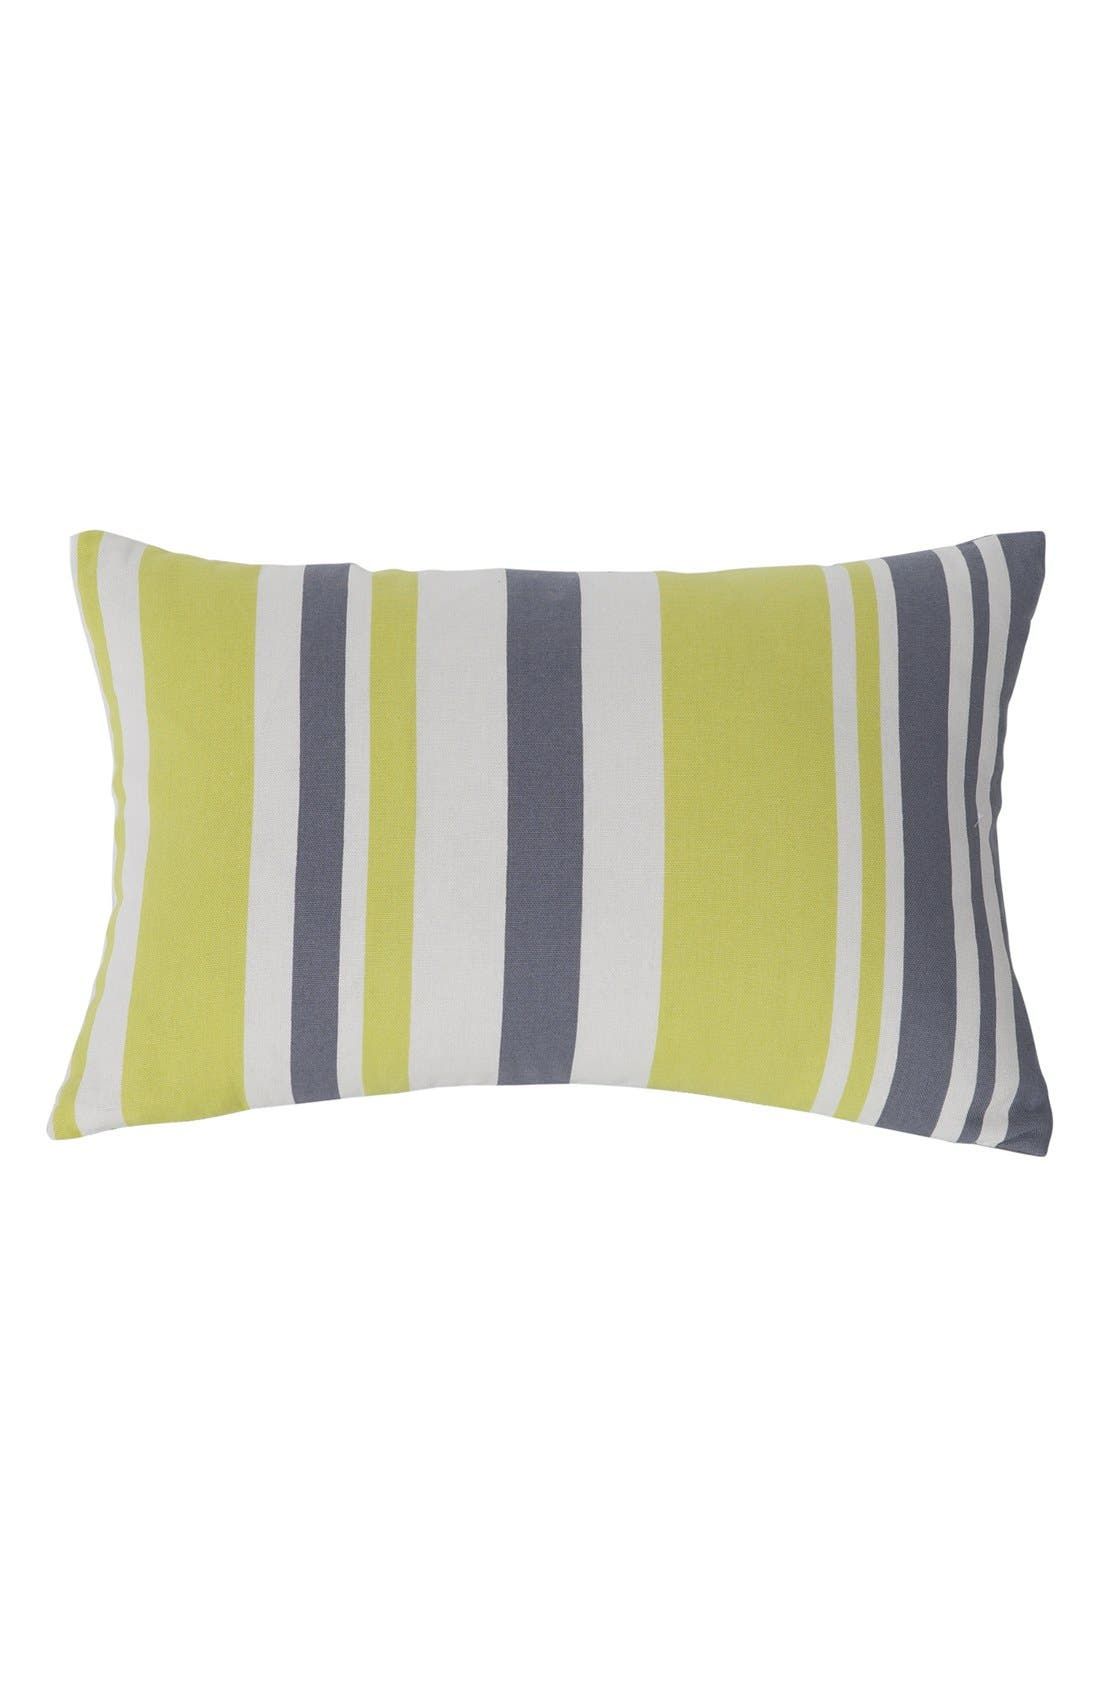 'Etta' Pillow,                         Main,                         color, Grey/ Citrus